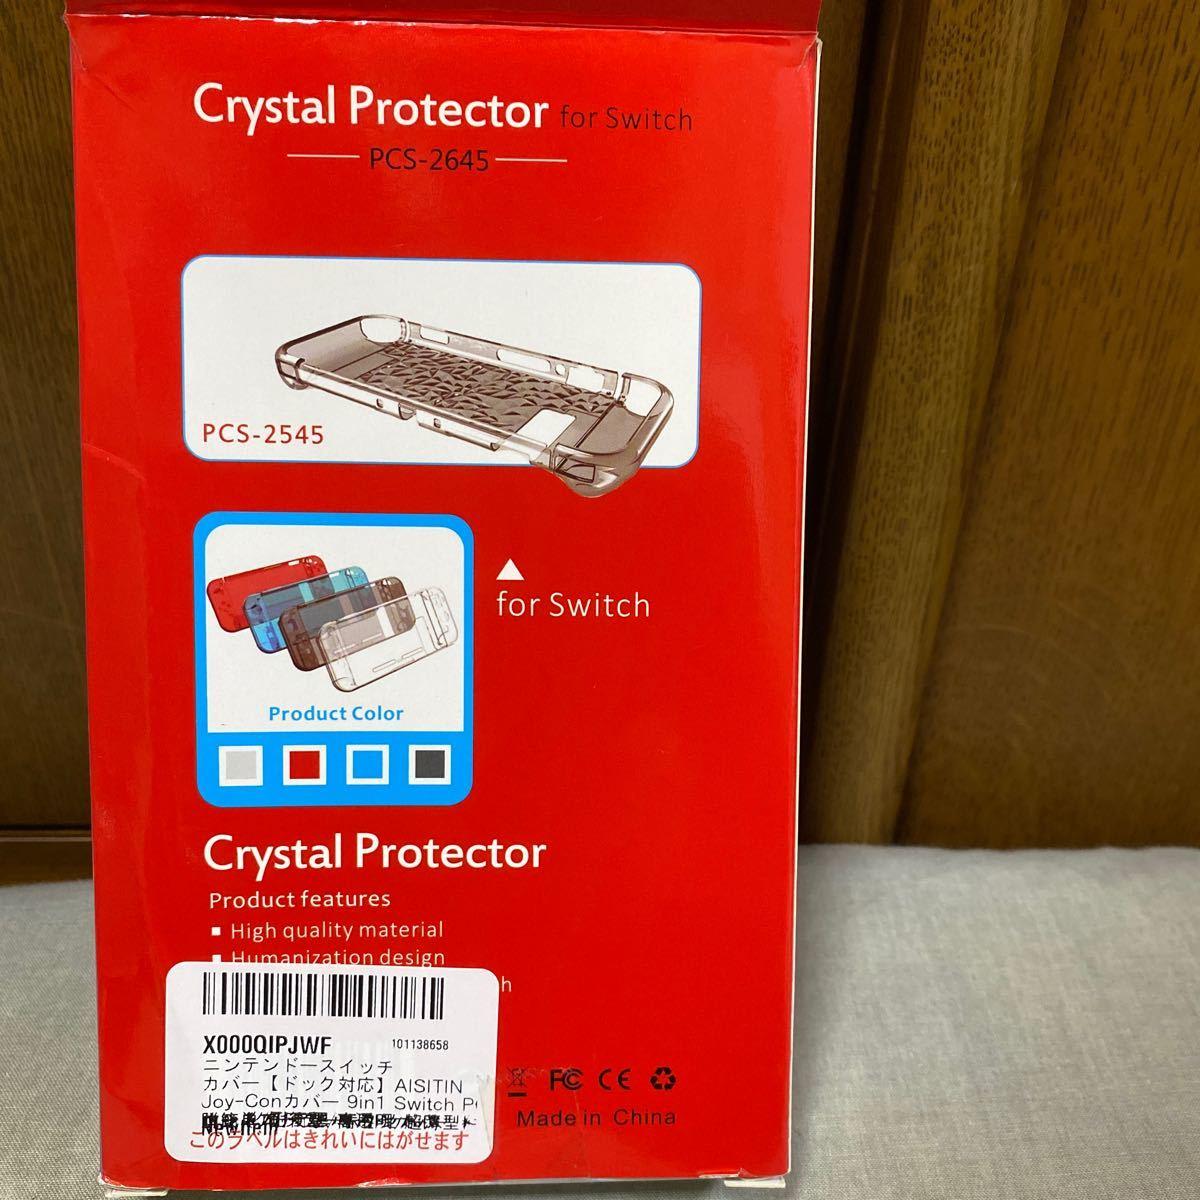 Nintendo Switch 任天堂 ニンテンドー スイッチカバー ダイヤモンドクリア黒+親指キャップ二種(青なし)